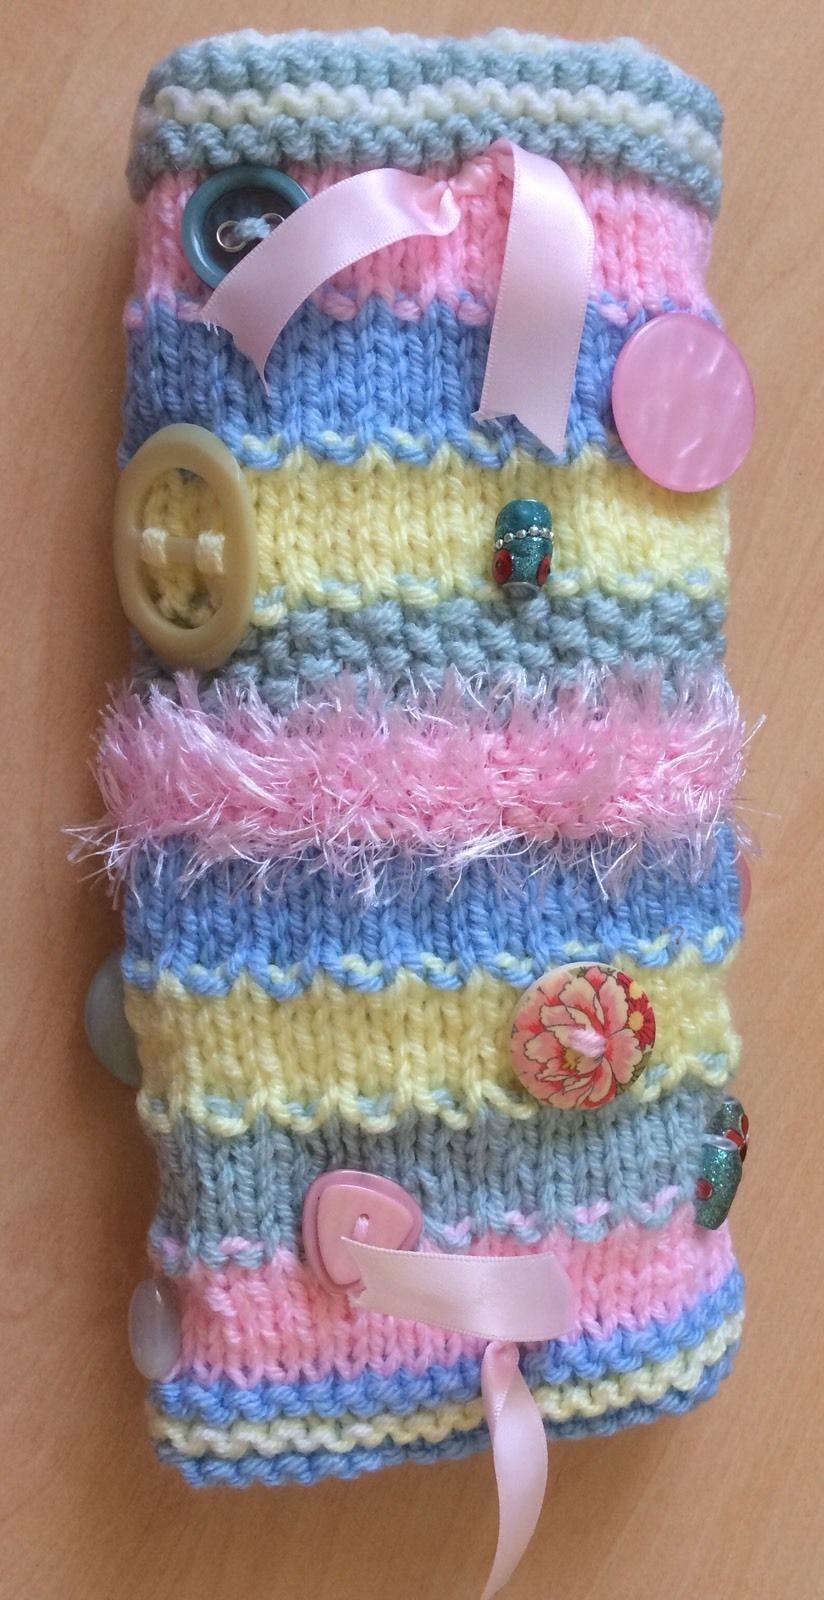 2 X Quality Hand-knitted TWIDDLEMUFF Twiddle-muff Dementia Sensory ...